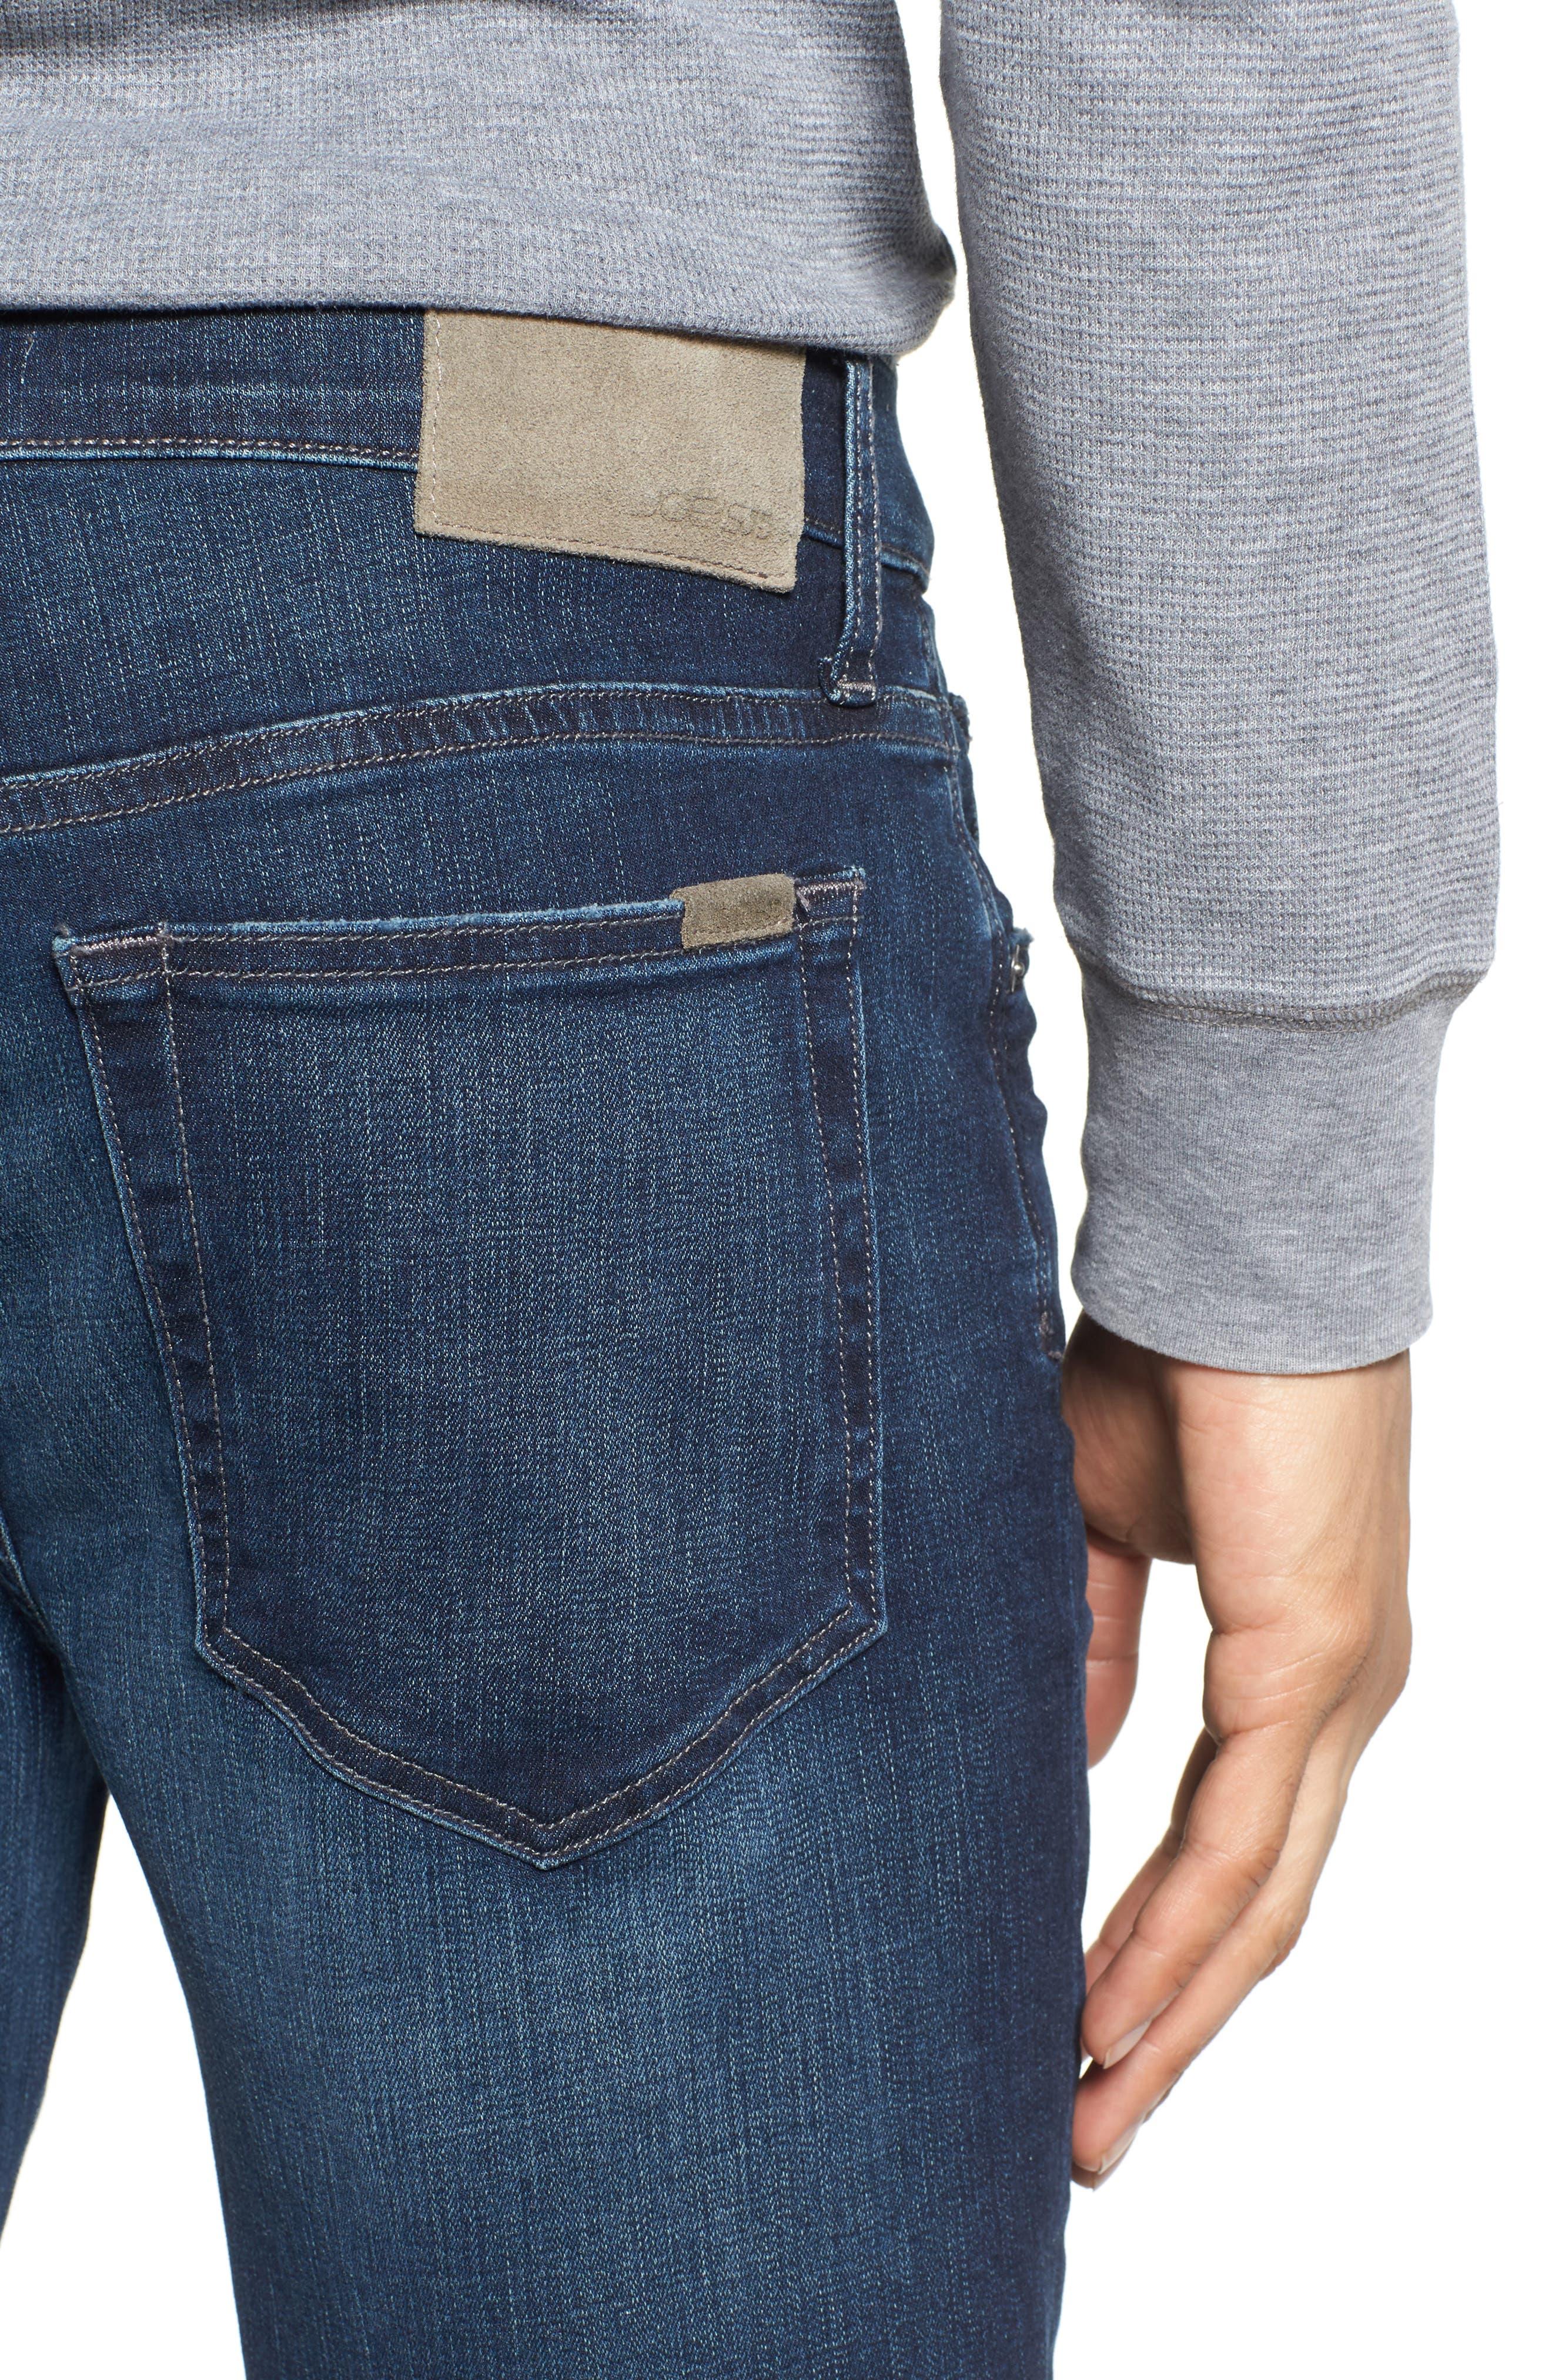 Kinetic Slim Fit Jeans,                             Alternate thumbnail 4, color,